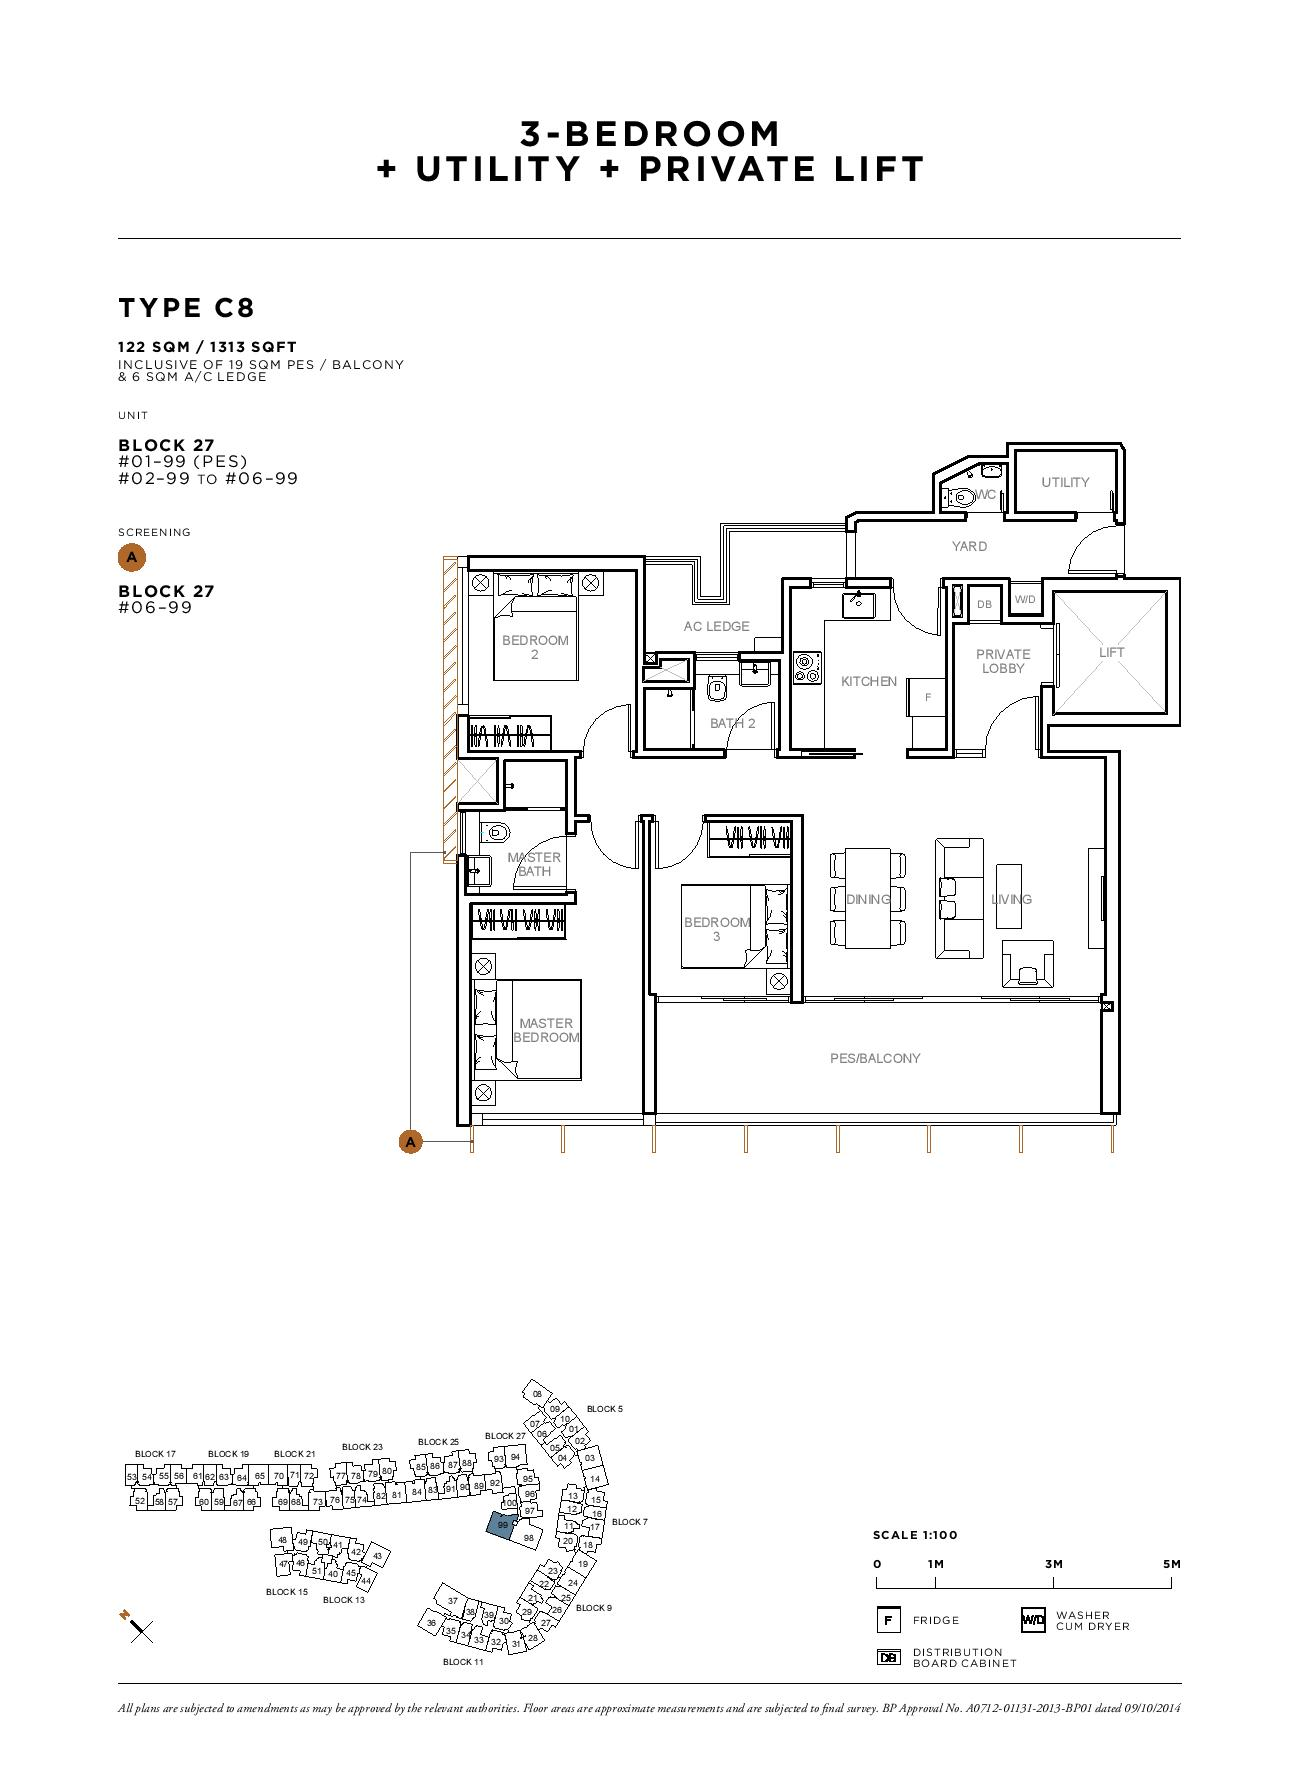 Sophia Hills 3 Bedroom + Utility Private Lift Type C8 Floor Plans